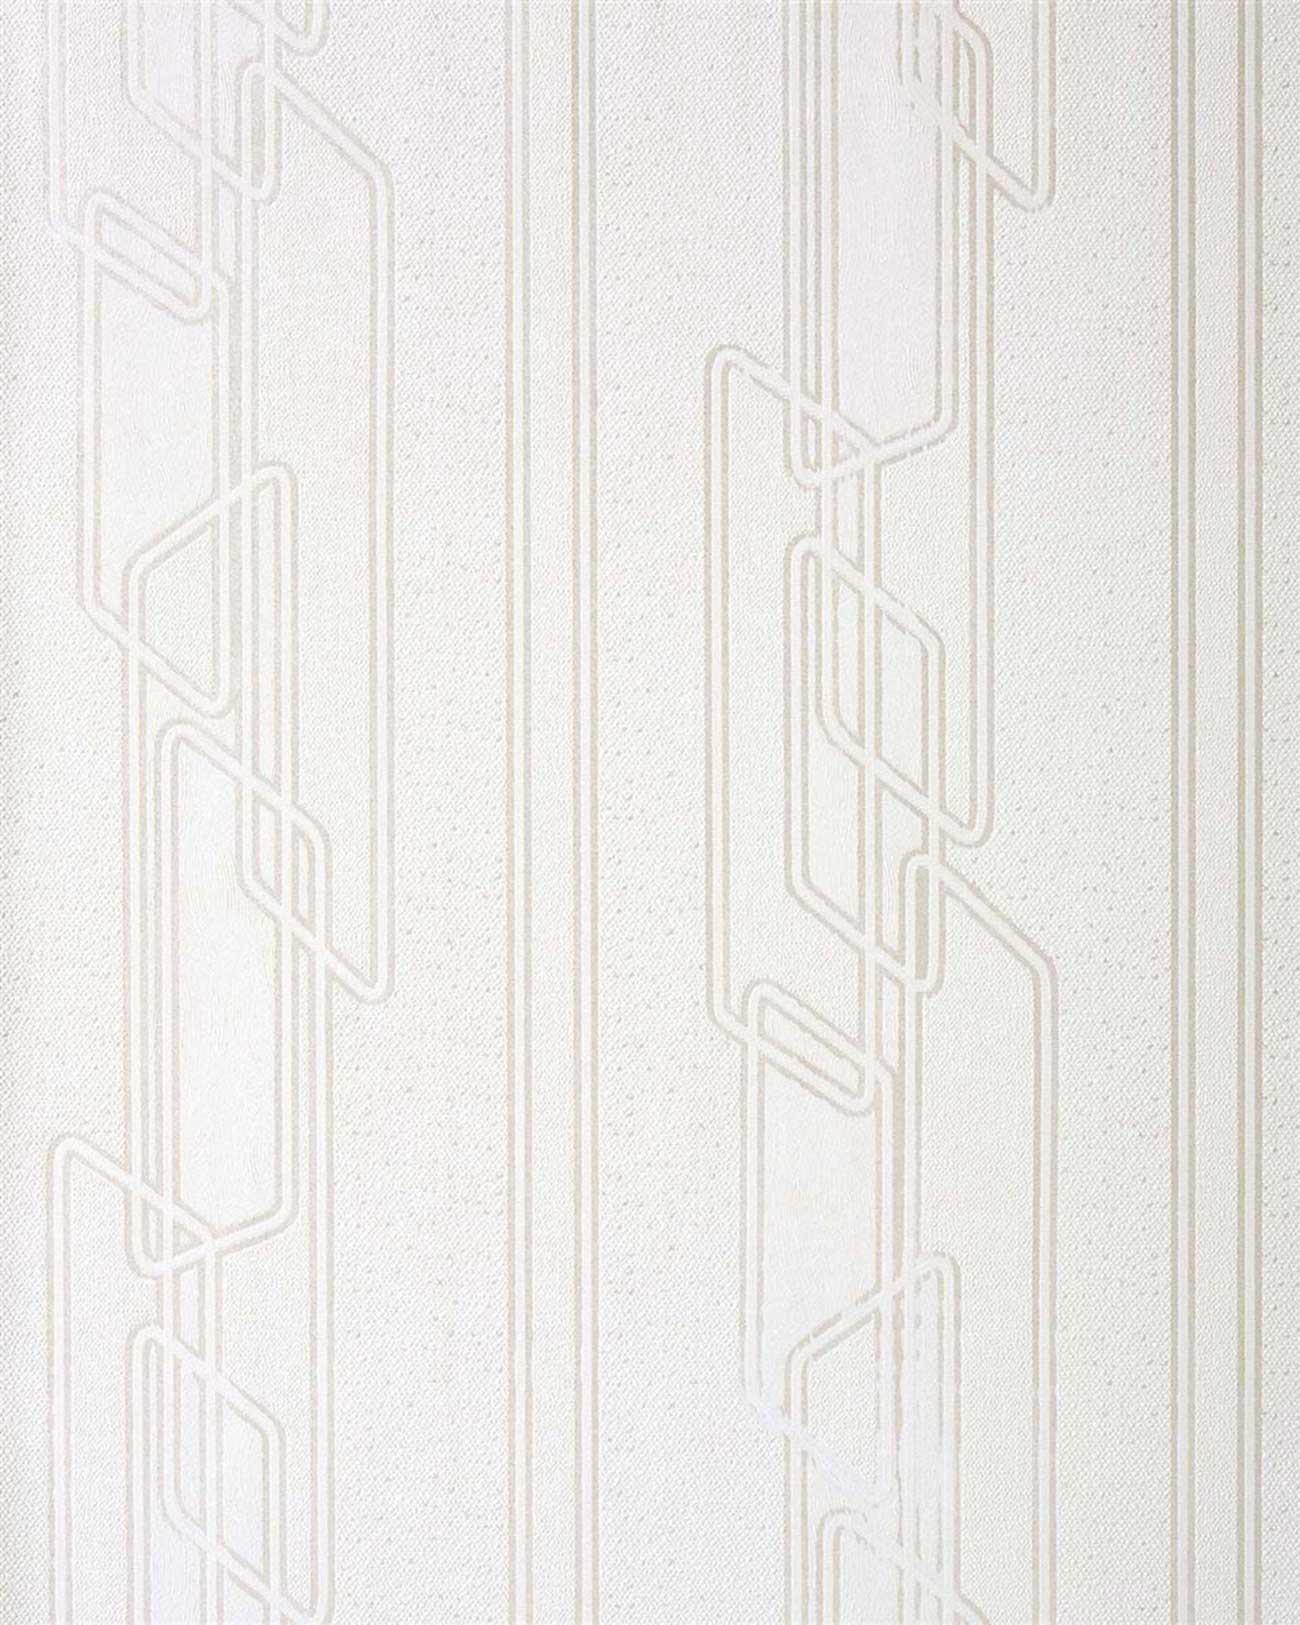 Tapeten Mit Muster ?berstreichen : Silver Wall Coverings Pattern